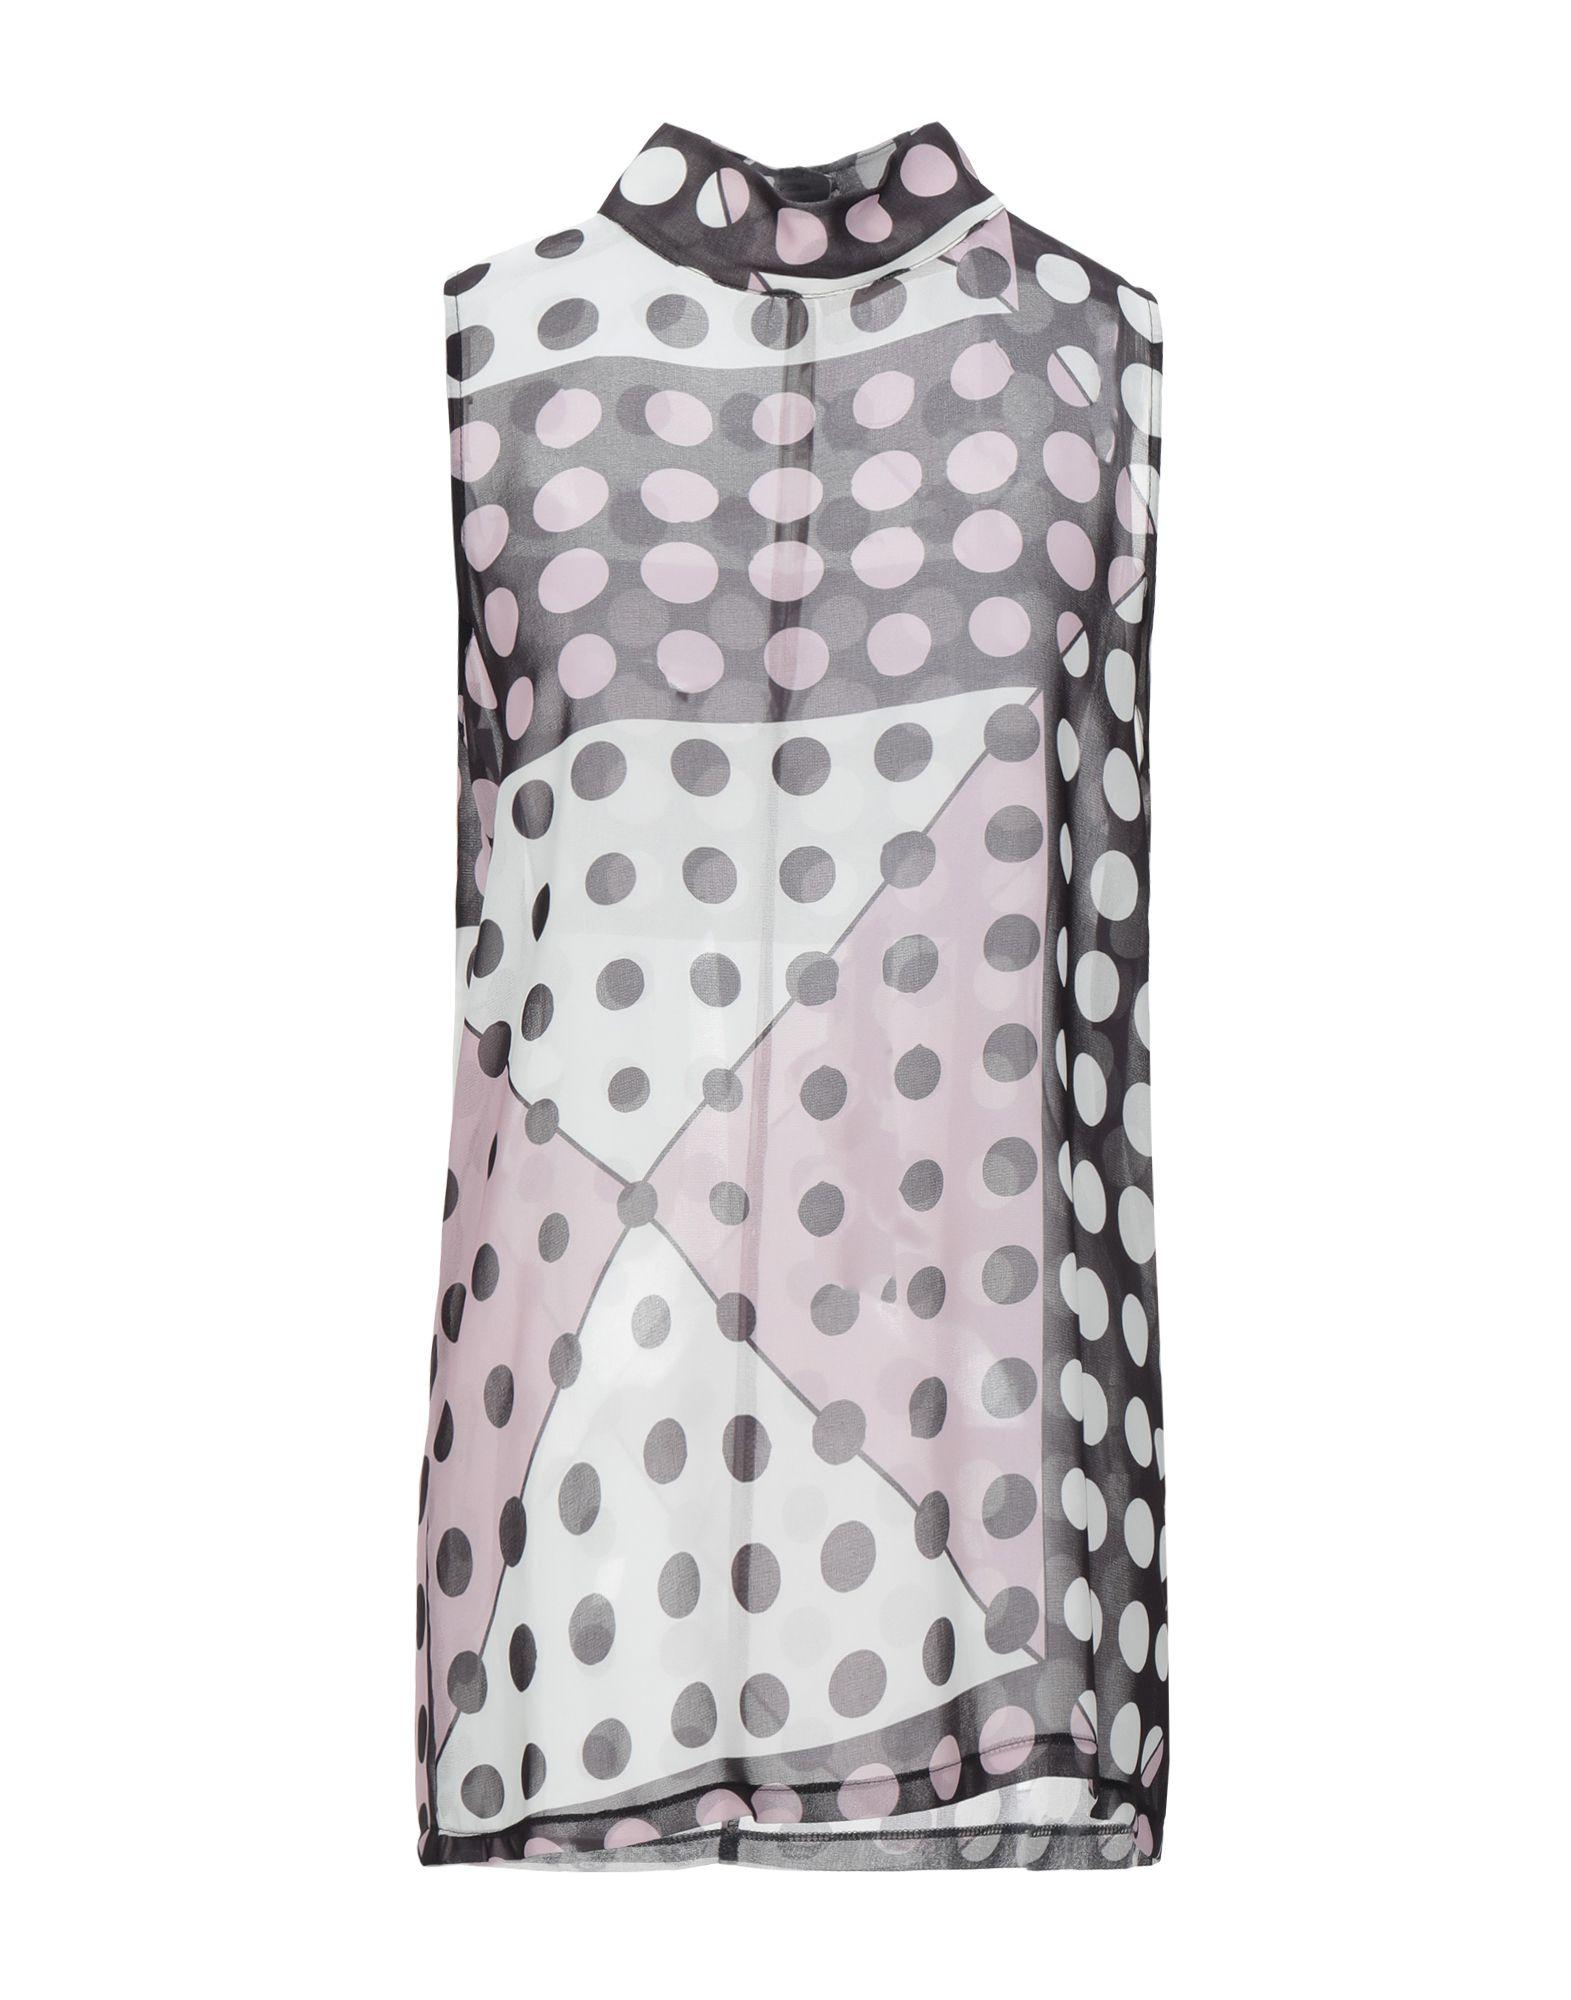 CRISTINA GAVIOLI COLLECTION Топ без рукавов cristina gavioli collection pубашка